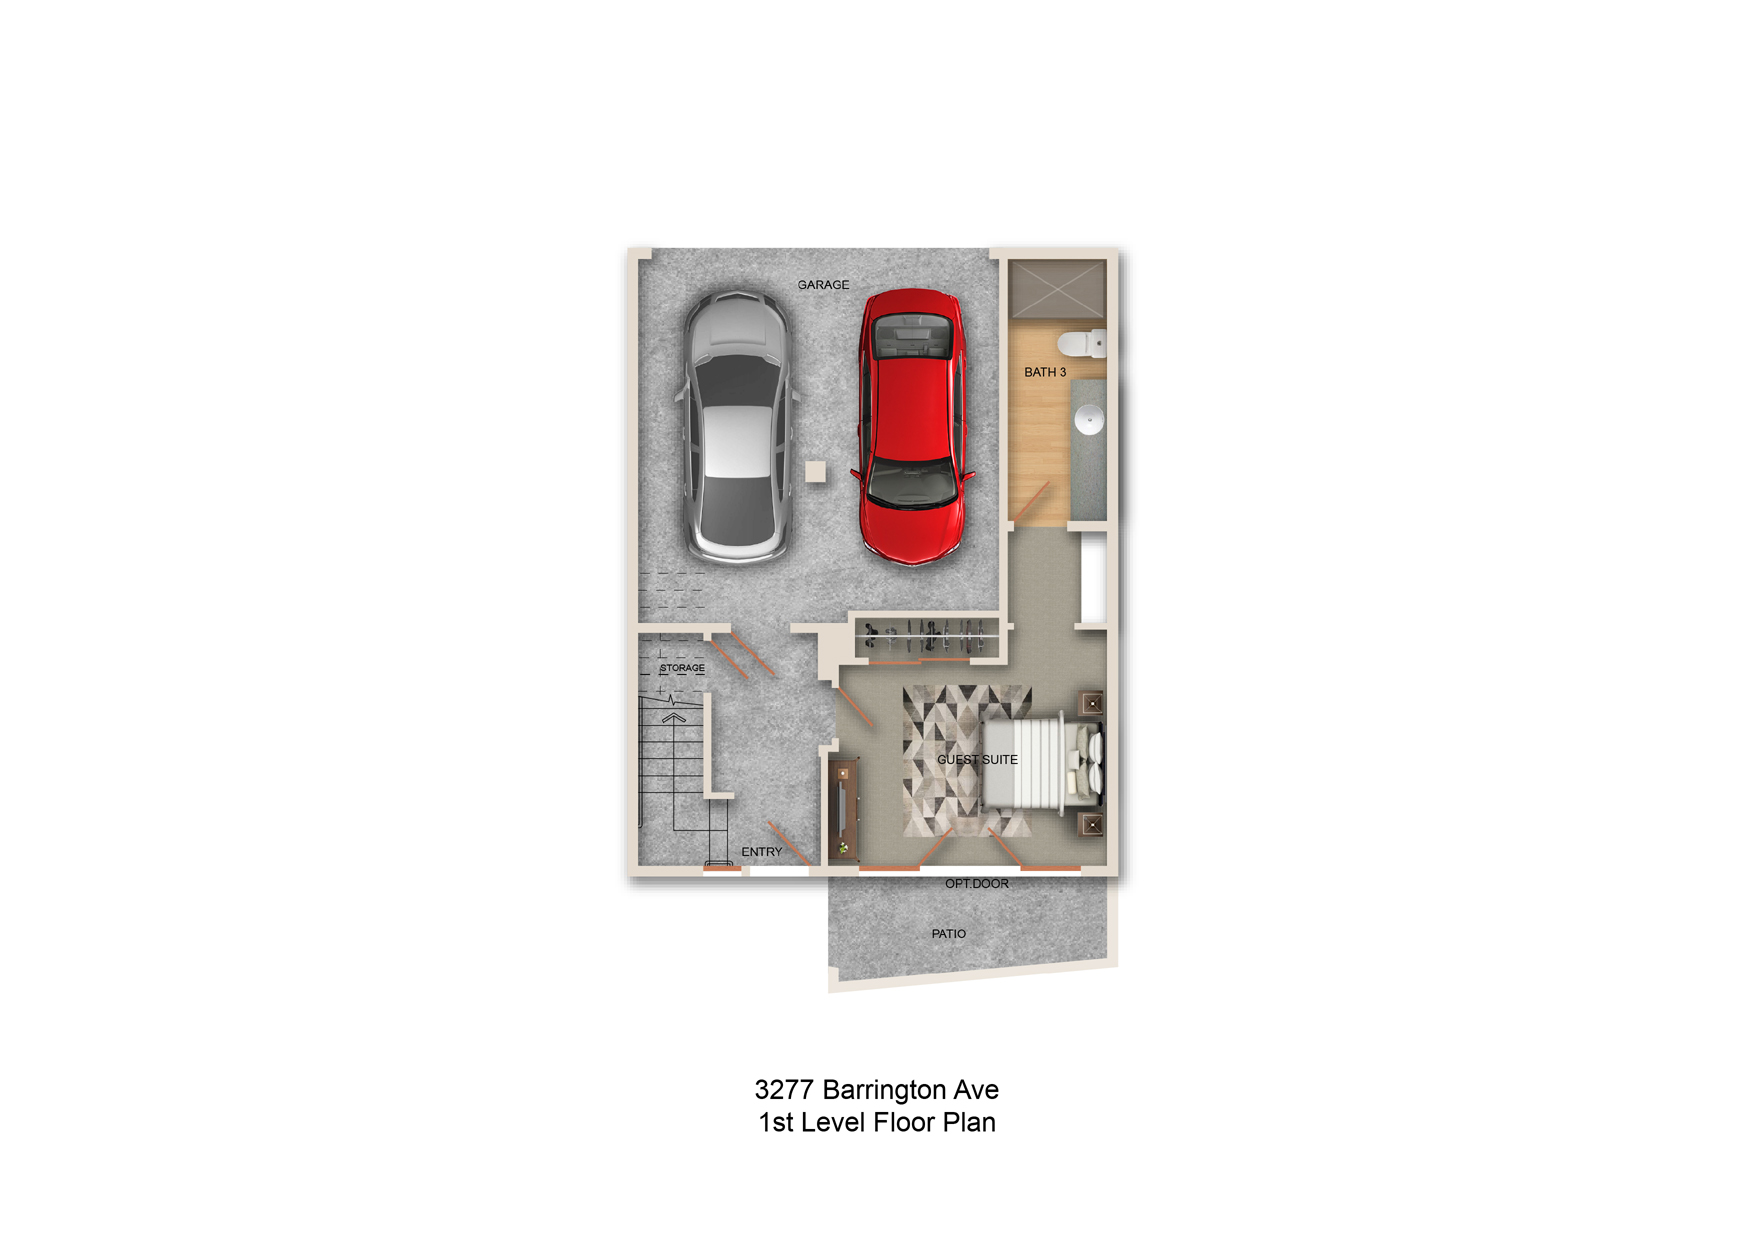 3277-Barrington-Ave-1st-Level-Floor-Plan-Web.jpg